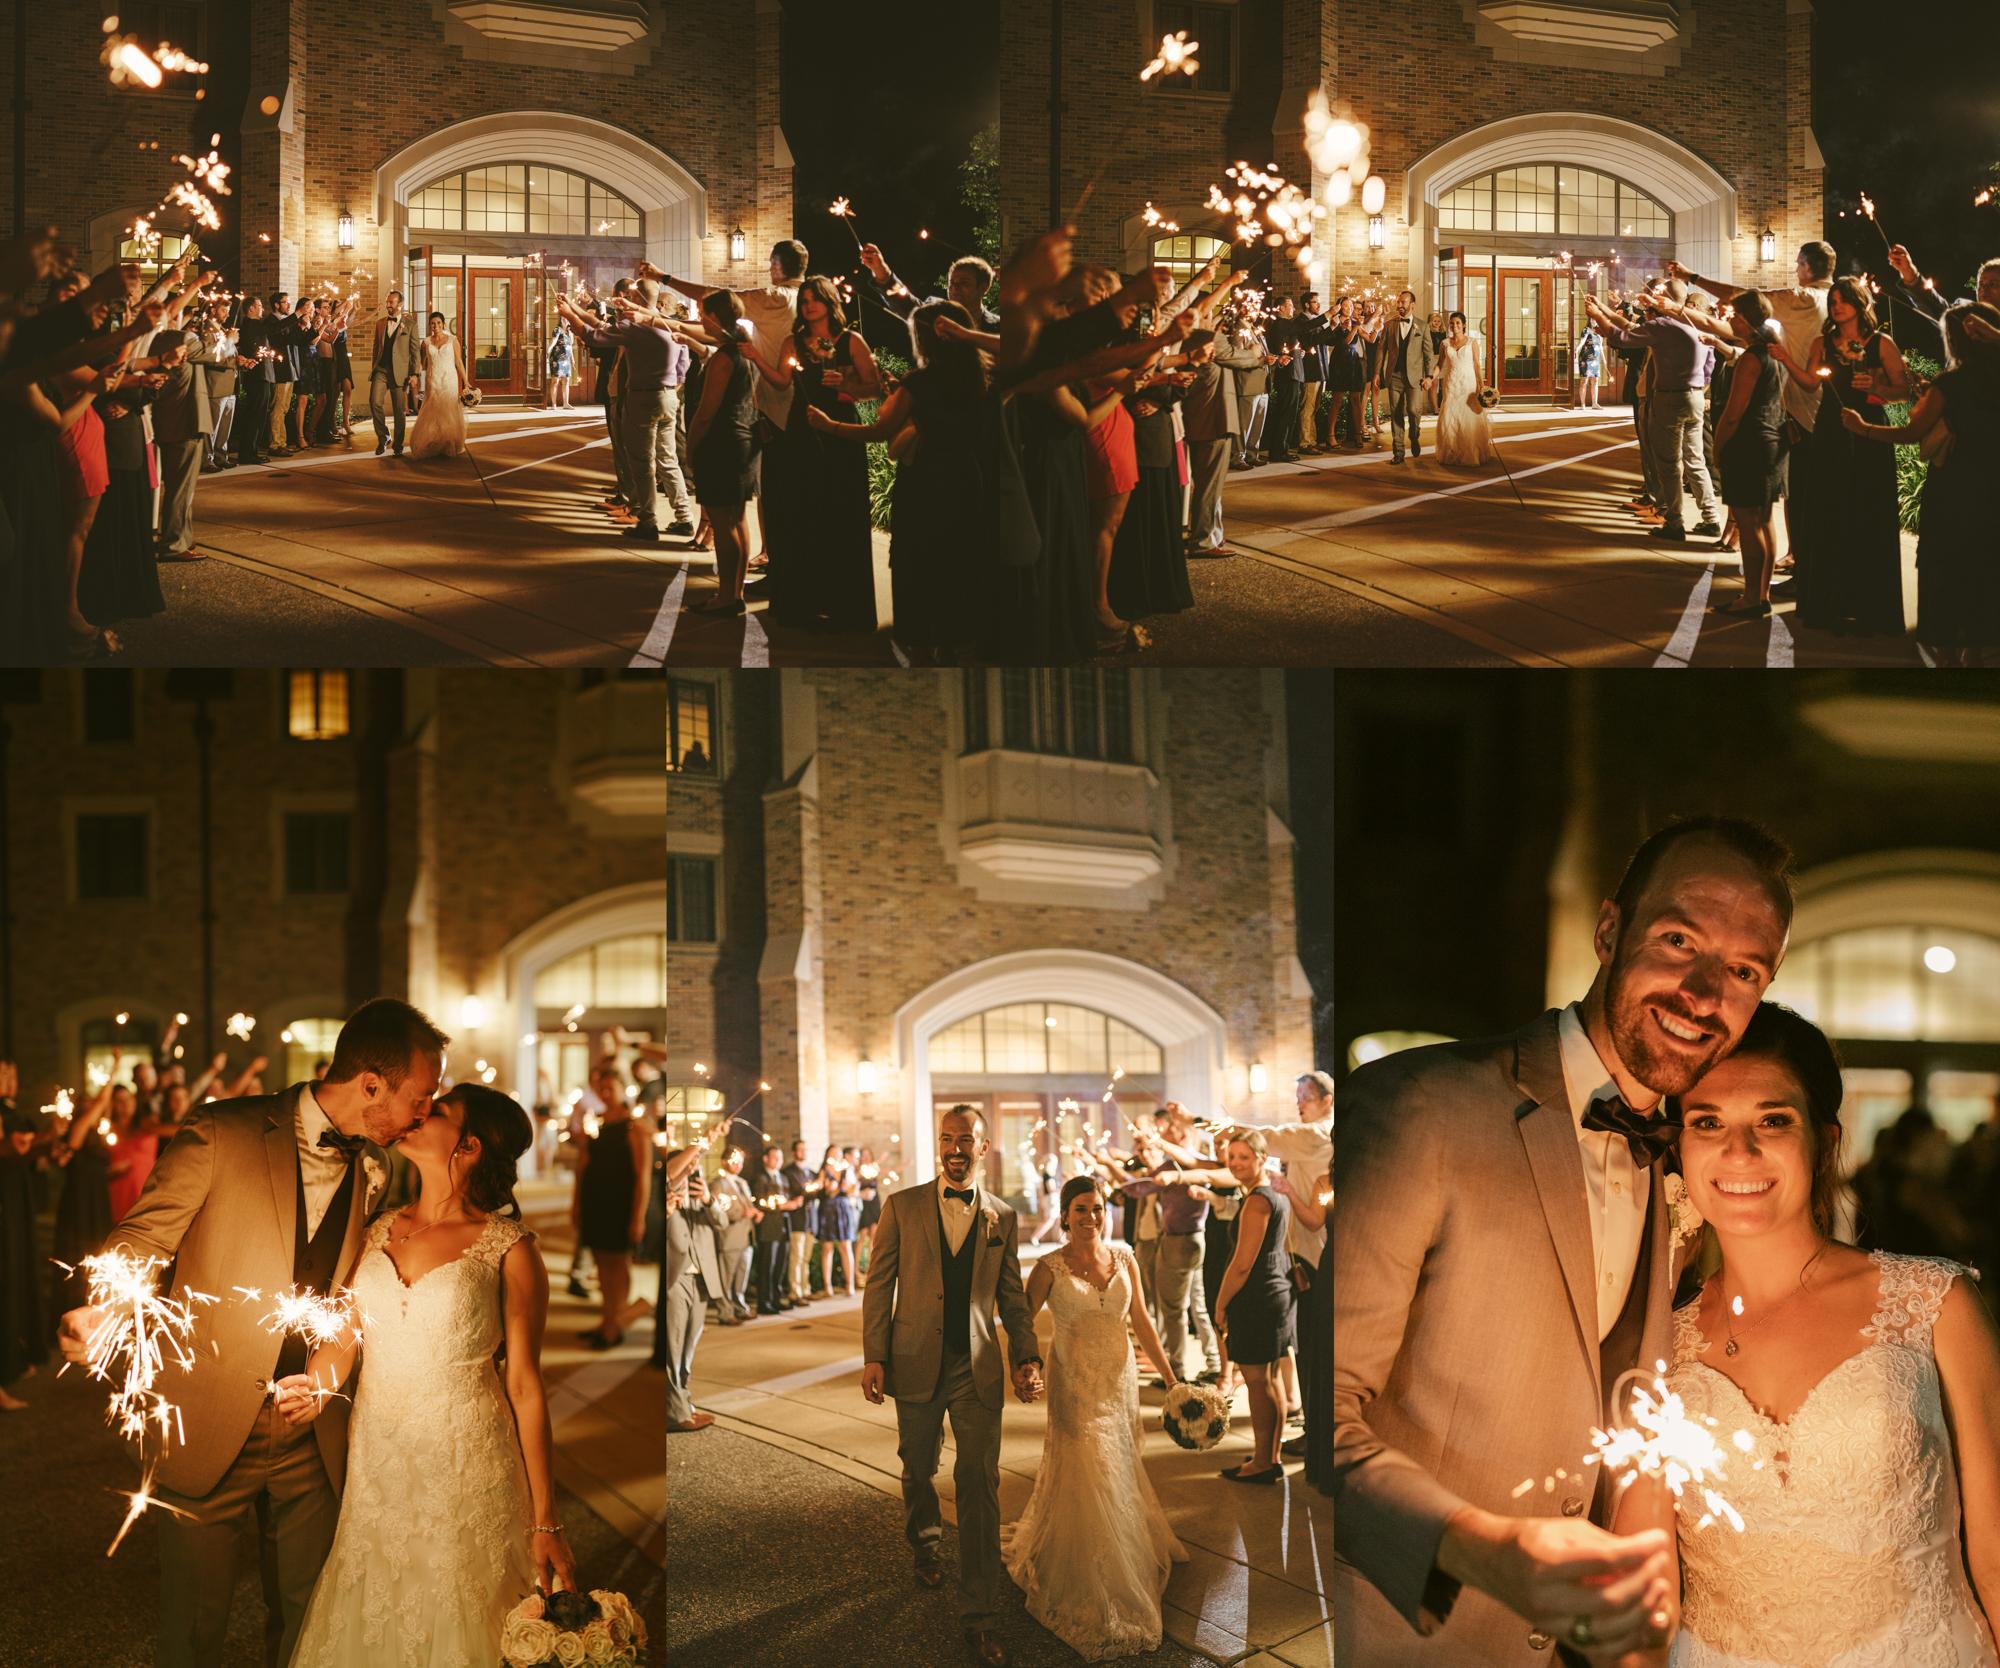 042 kaitlyn-colin-notre-dame-wedding.jpg